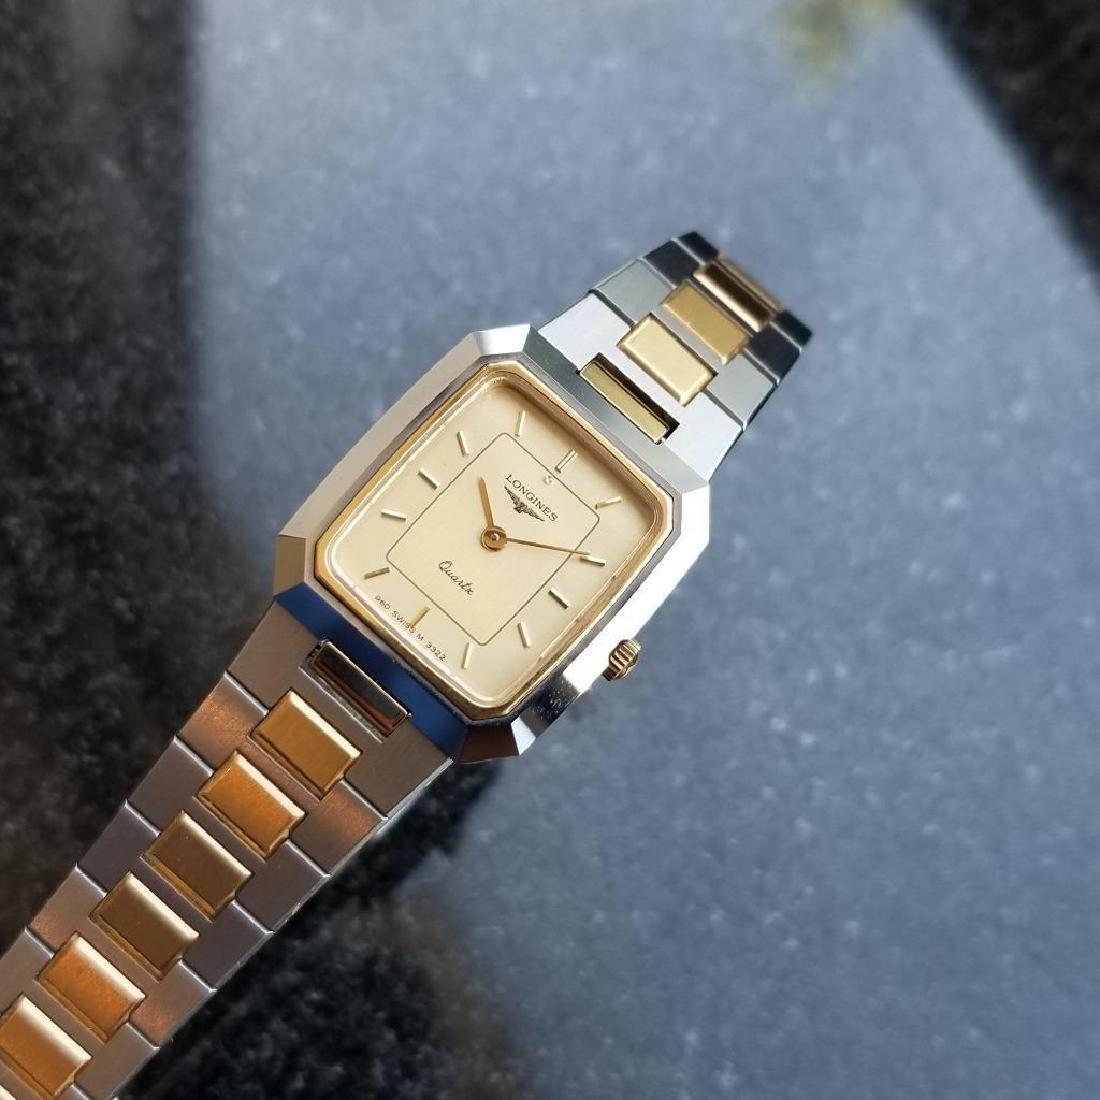 Longines Ladies 1980s Gold Plated Stainless Quartz - 7